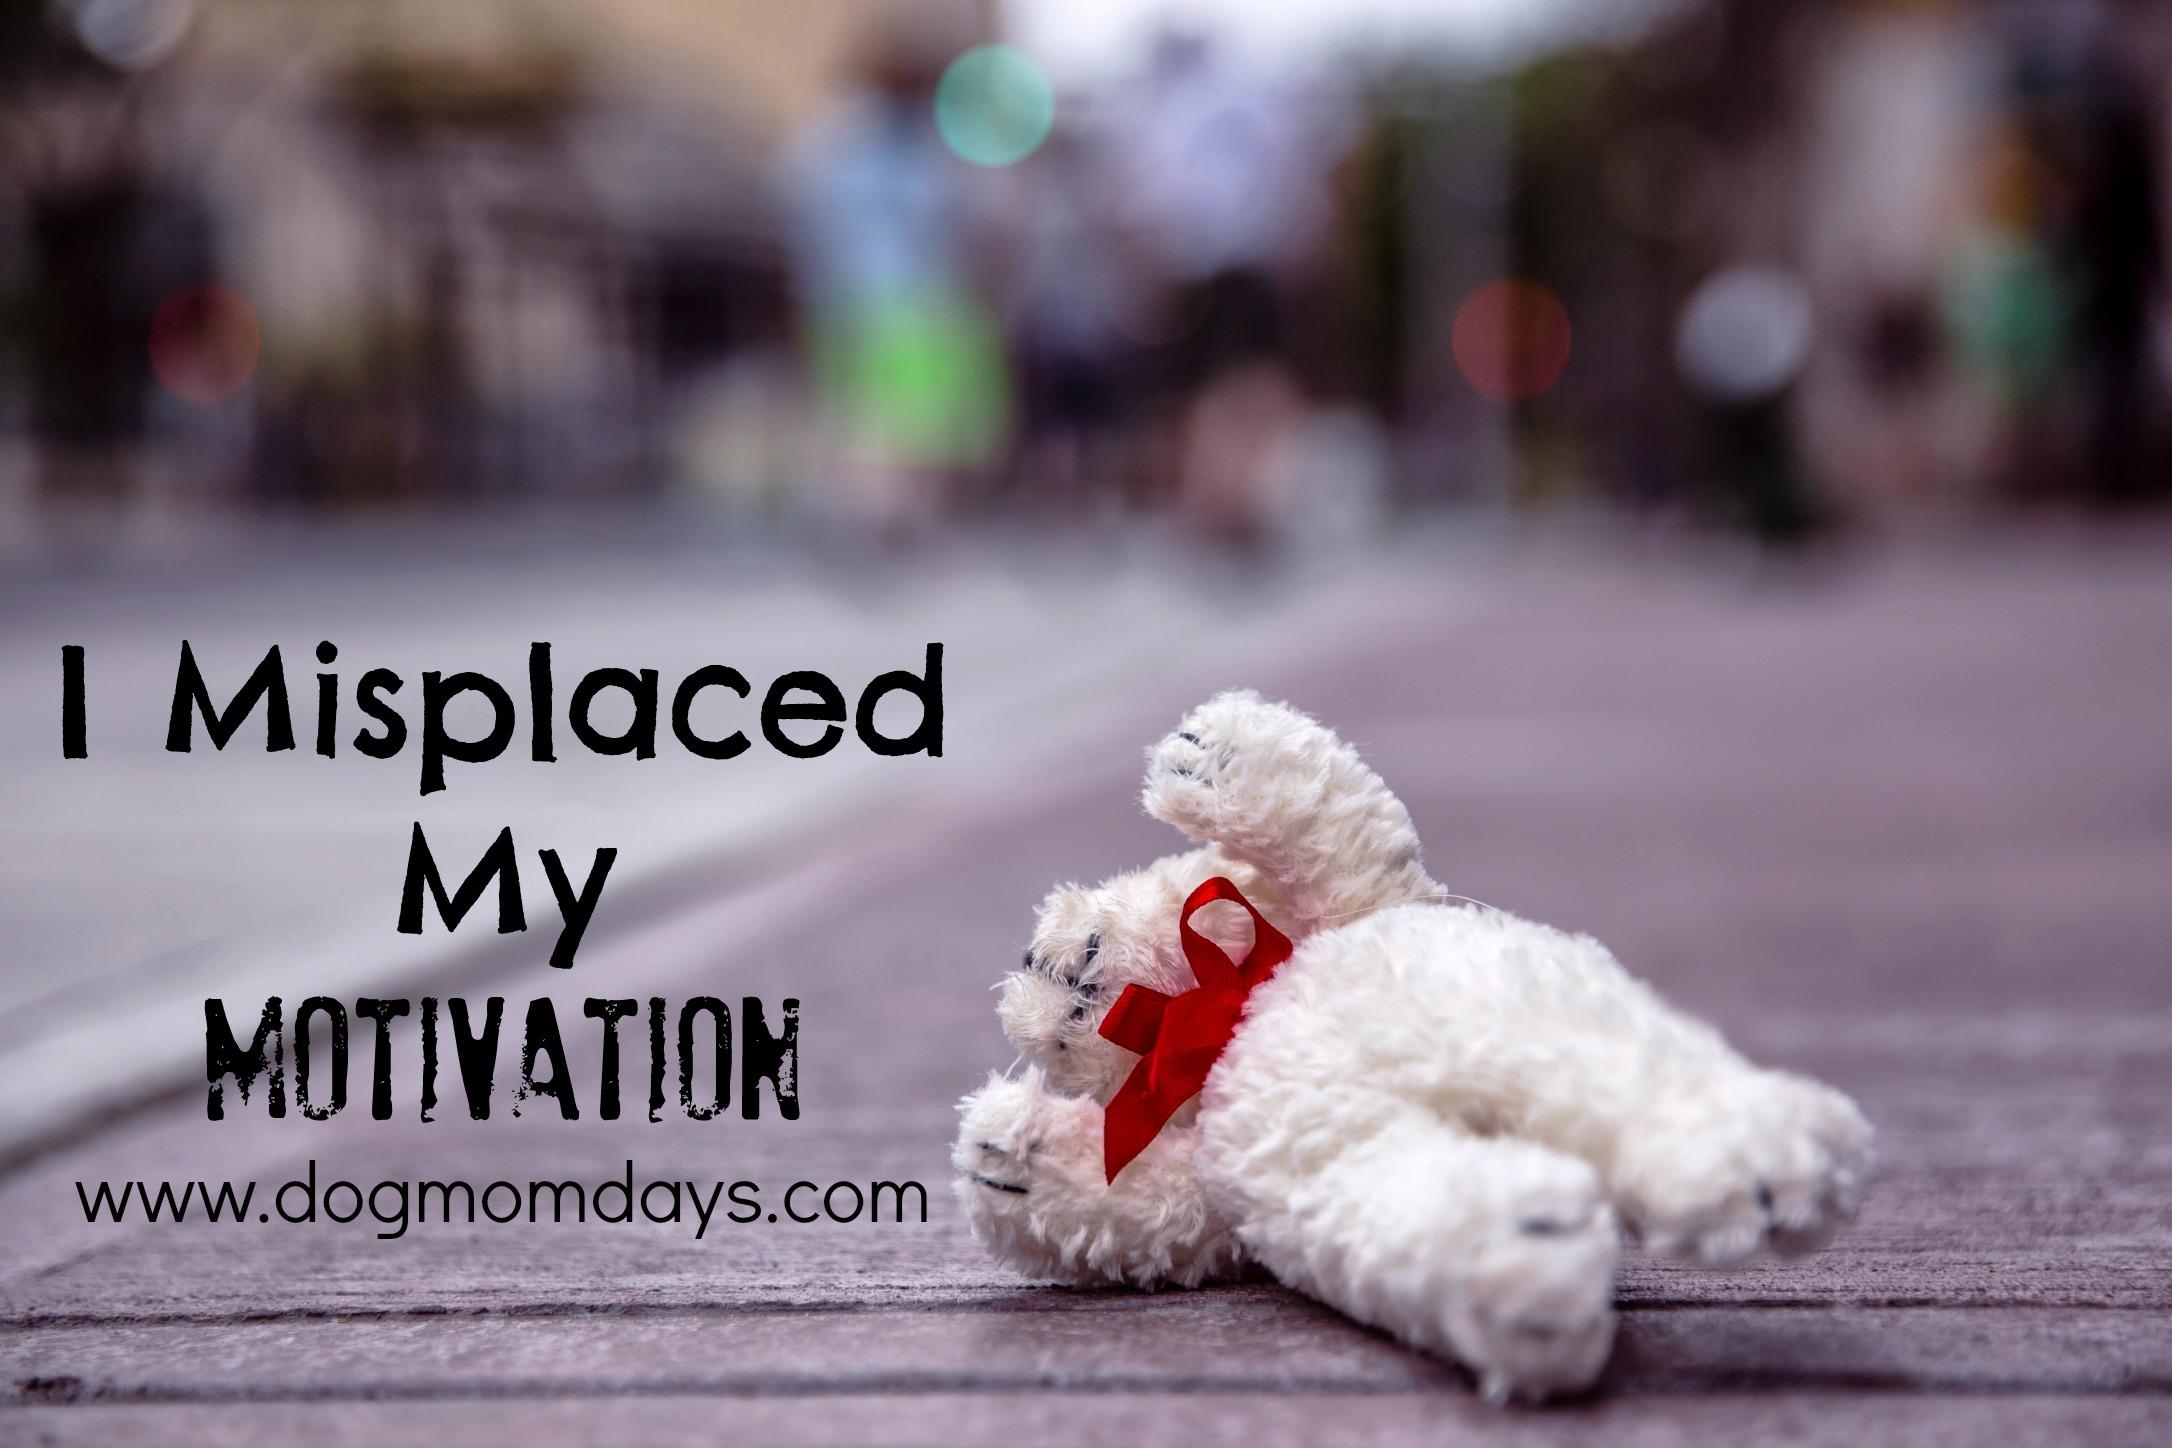 I misplaced my motivation